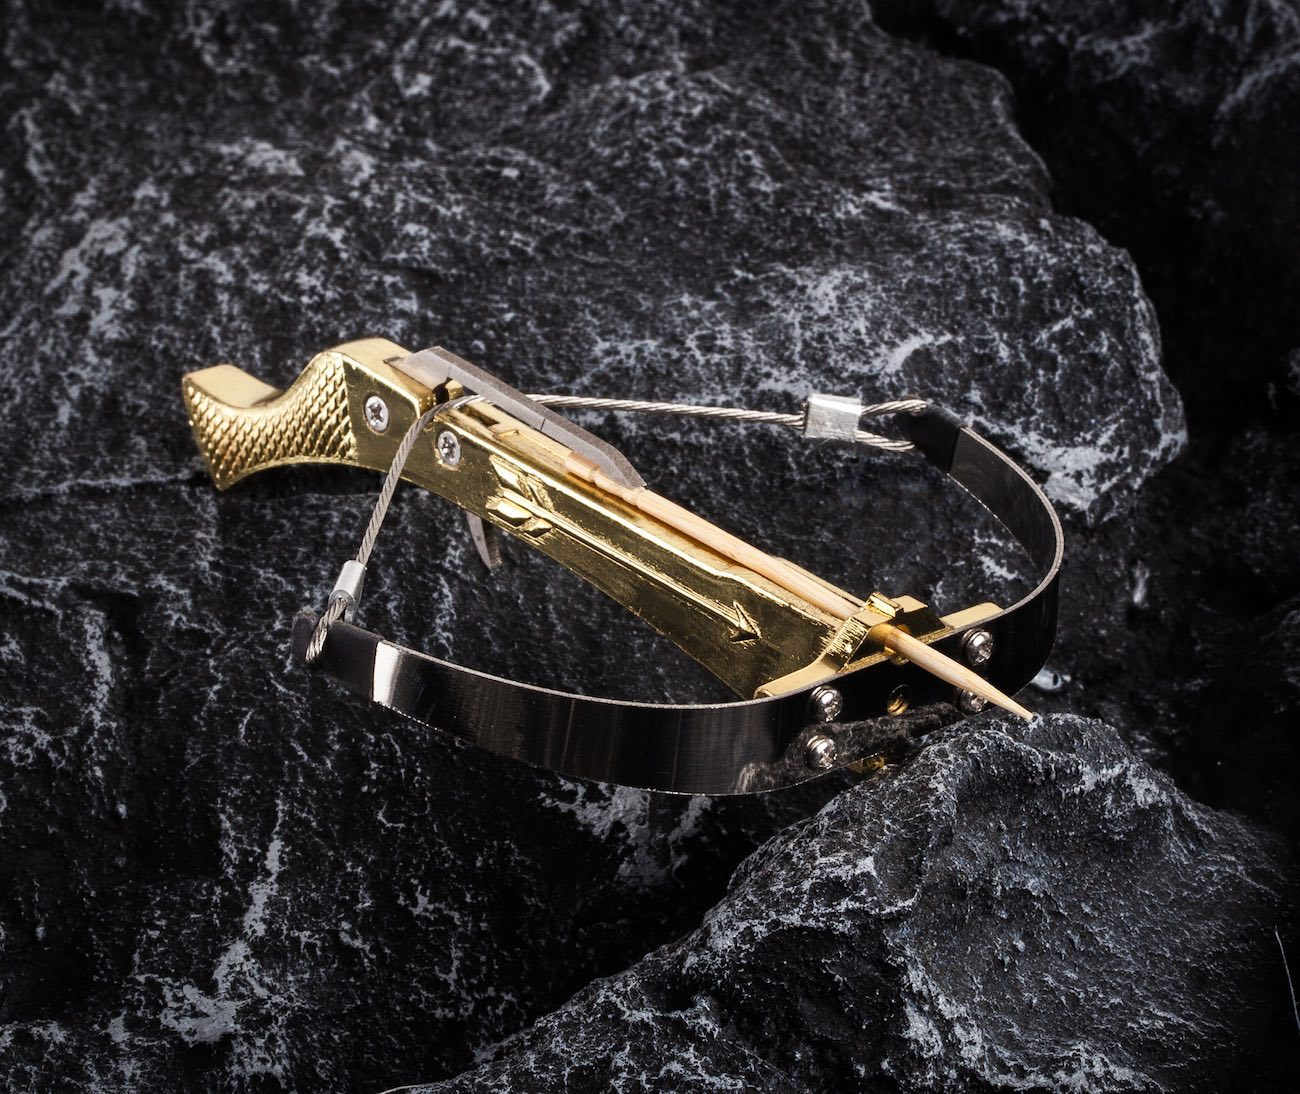 UncommonCarry Bowman Mini Crossbow